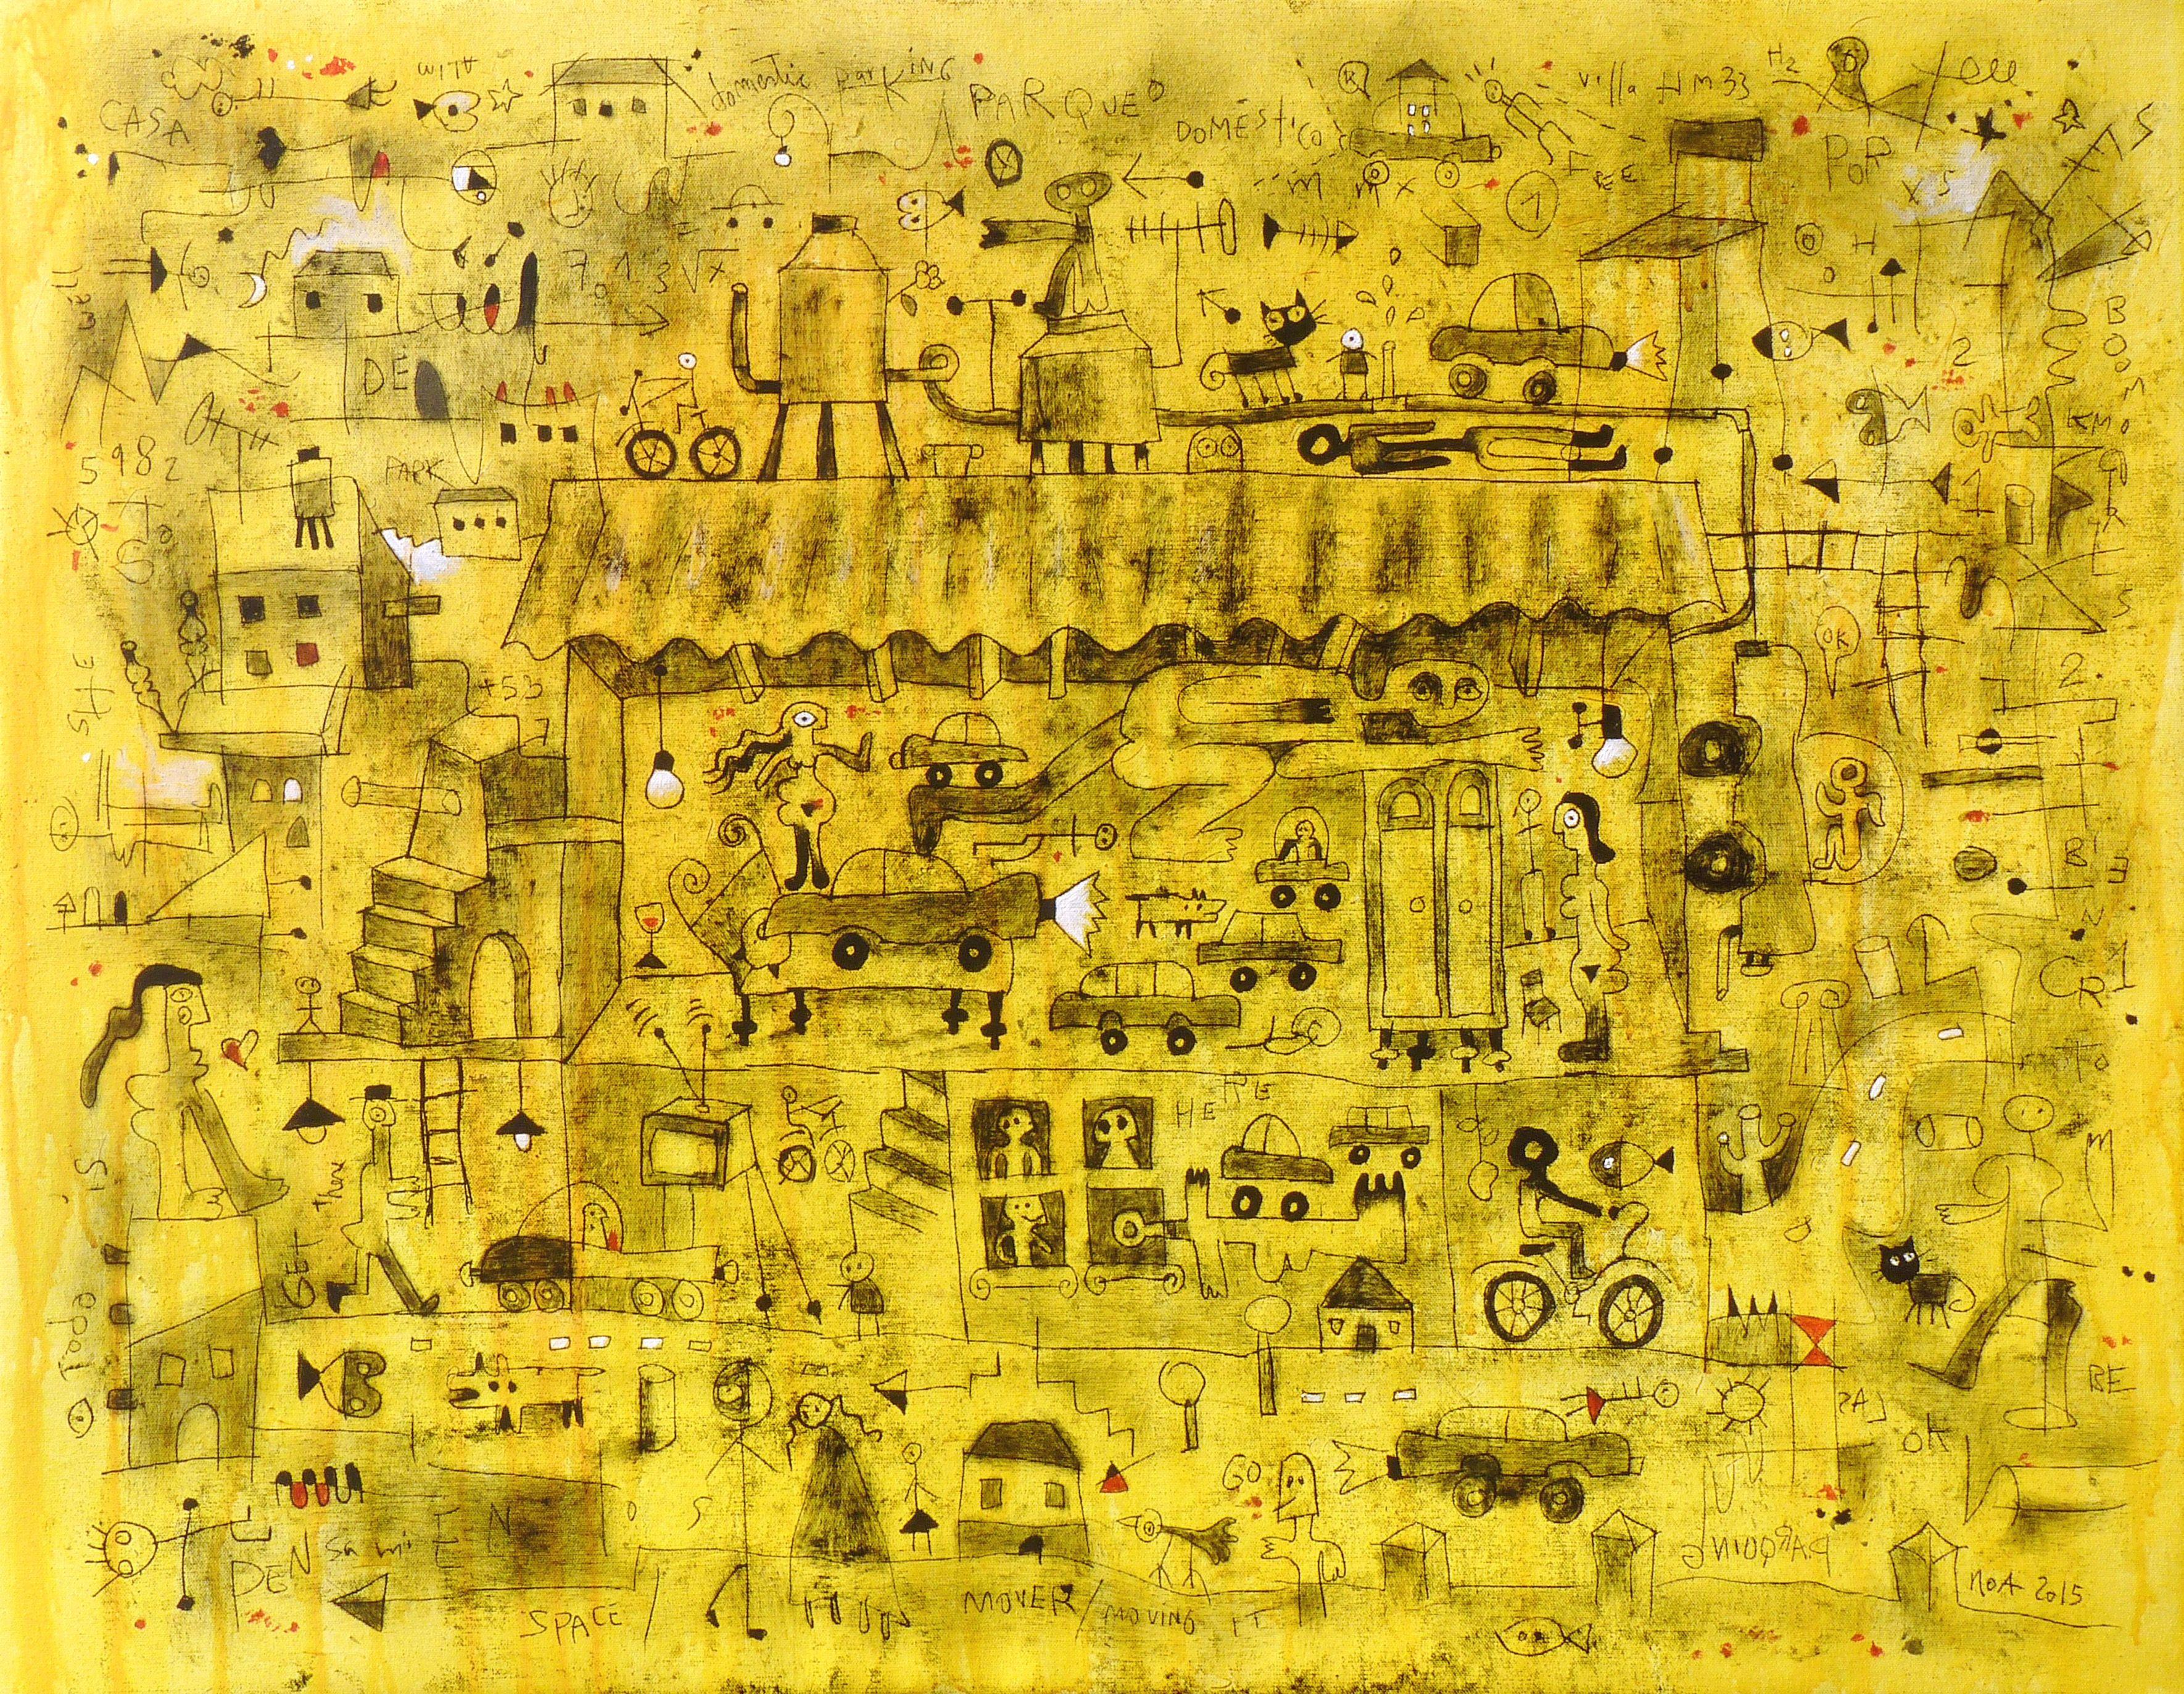 NOA, Luis Rodriguez, cuban artist, cuban art, contemporary art ...